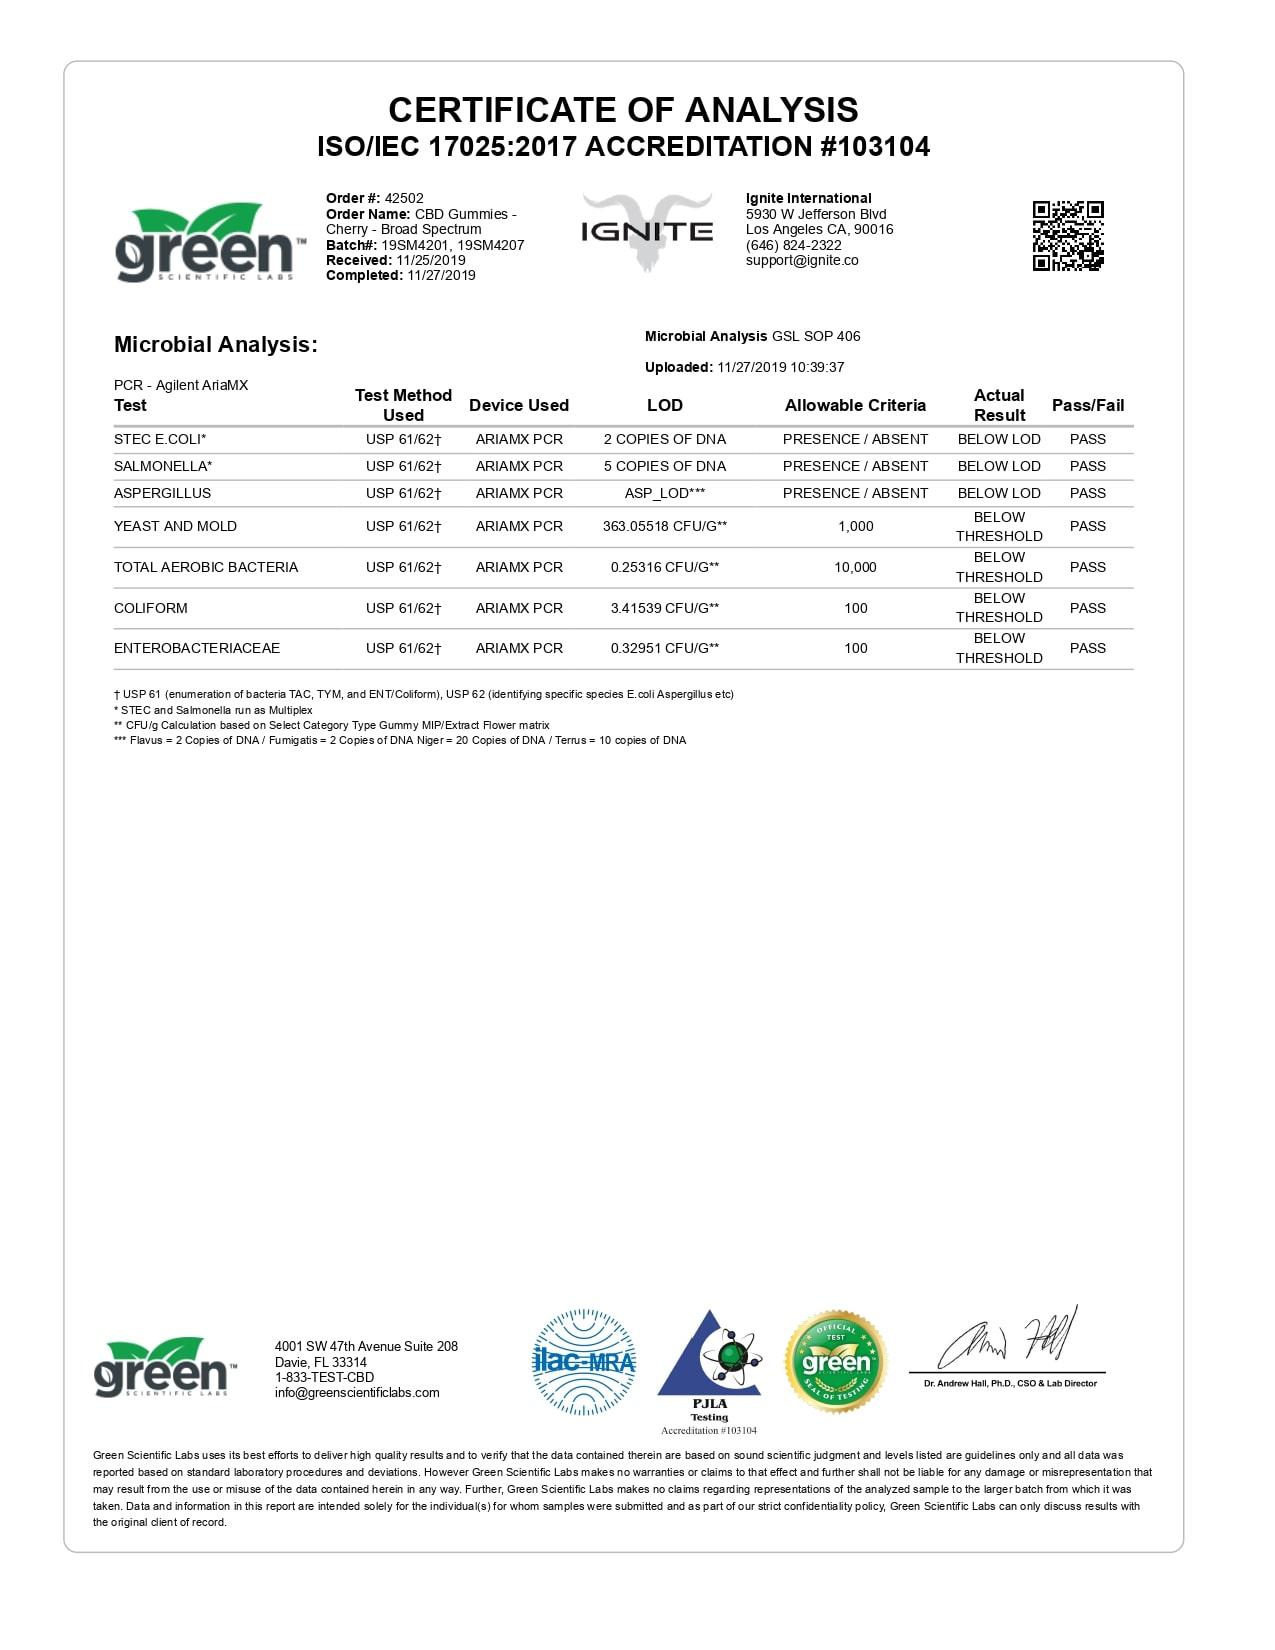 IGNITE CBD Gummies Cherry Lab Report Broad Spectrum 40mg